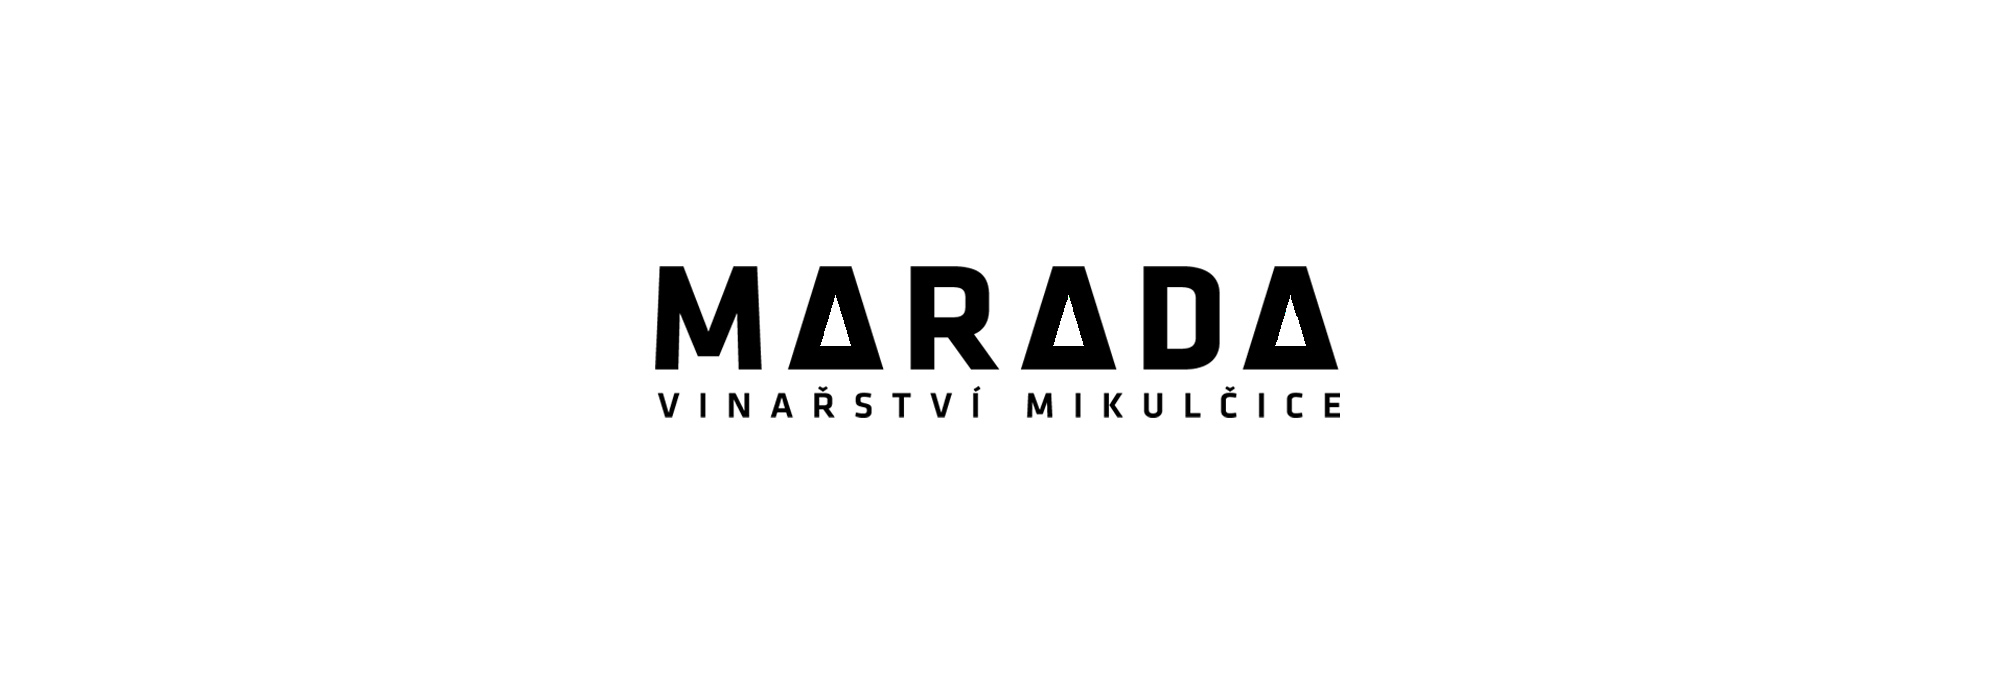 Vínařství Marada